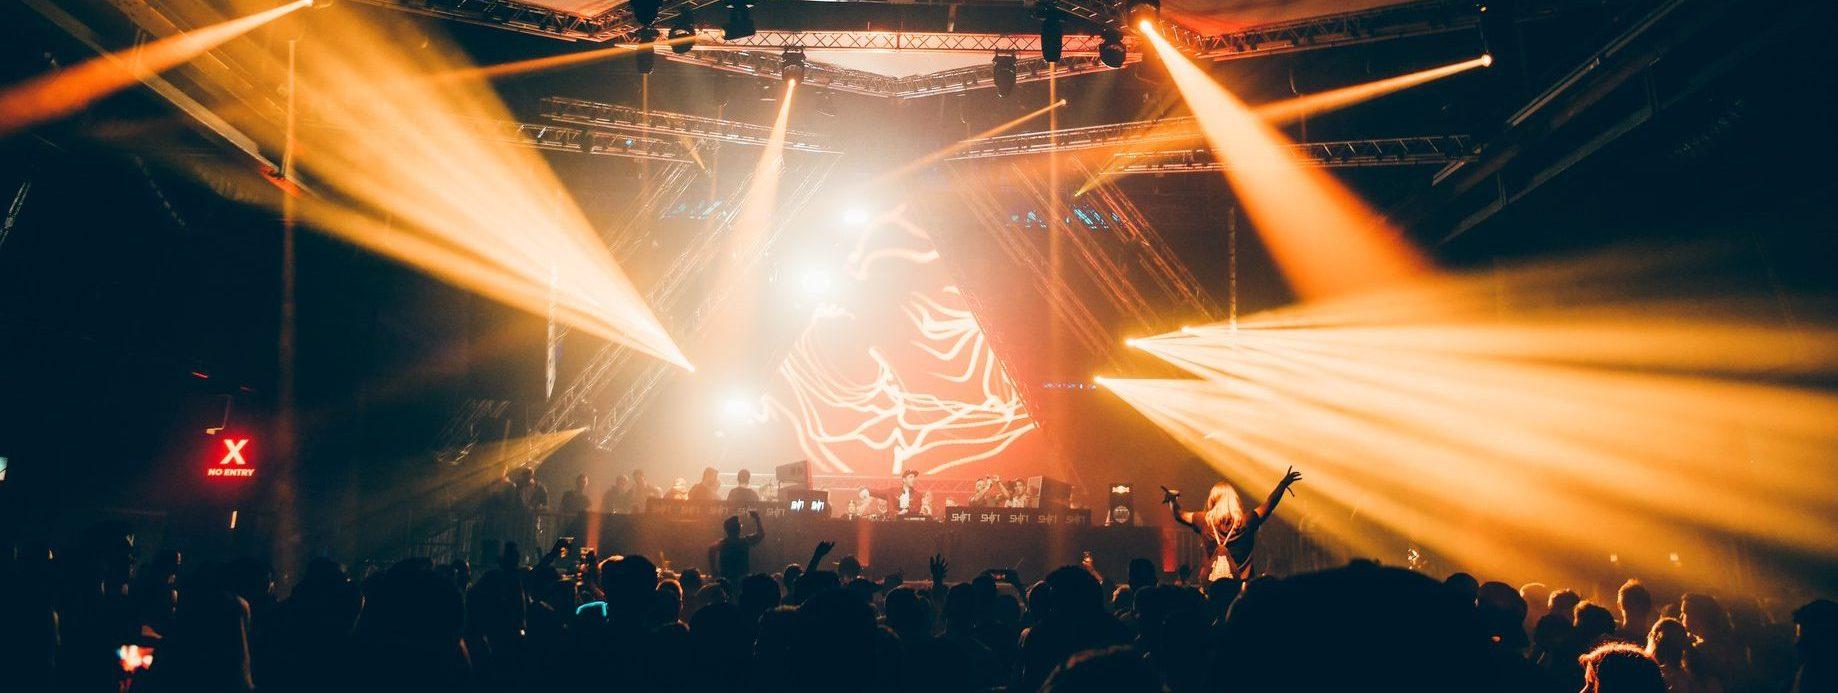 Mozhart Hardstyle Symphonies Podcast Rawstyle, Hardcore Frenchcore Hard Raw Harder Styles DJ Producer Österreich Austria Electric Love ELF SD Shutdown Festival